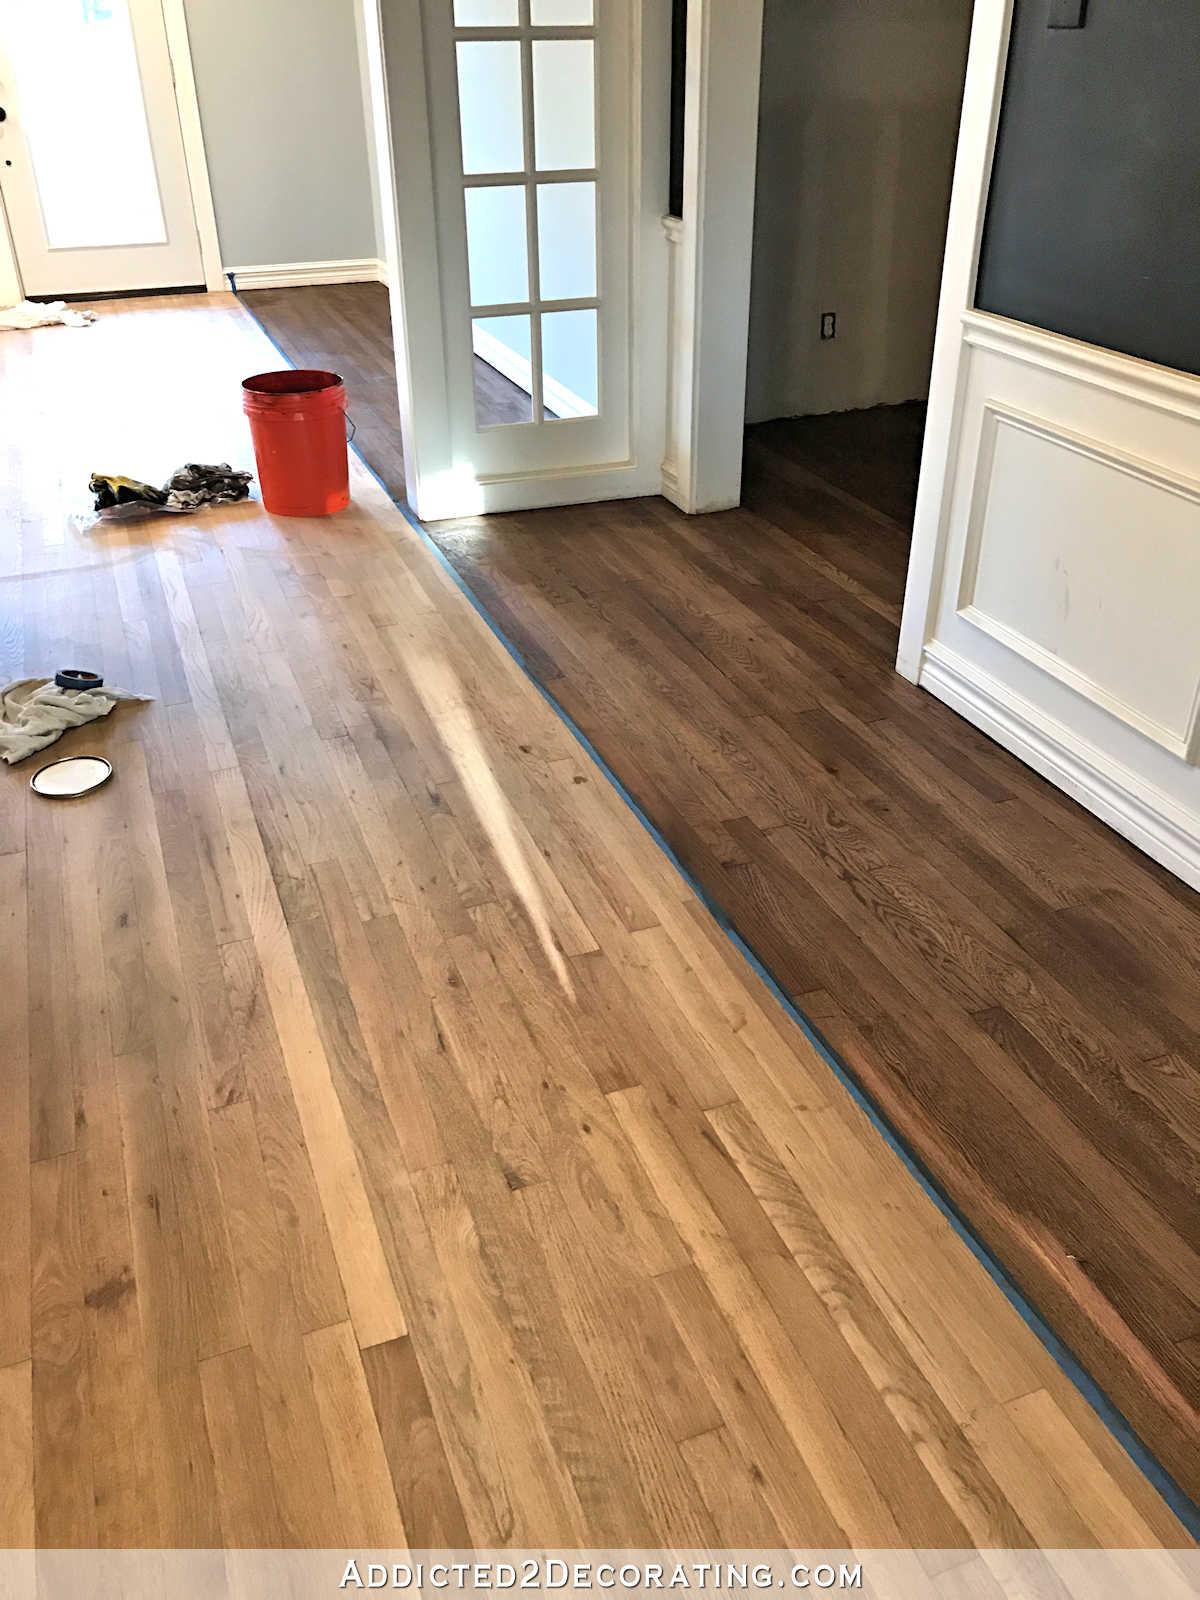 2 oak hardwood flooring of adventures in staining my red oak hardwood floors products process inside staining red oak hardwood floors 6 stain on partial floor in entryway and music room